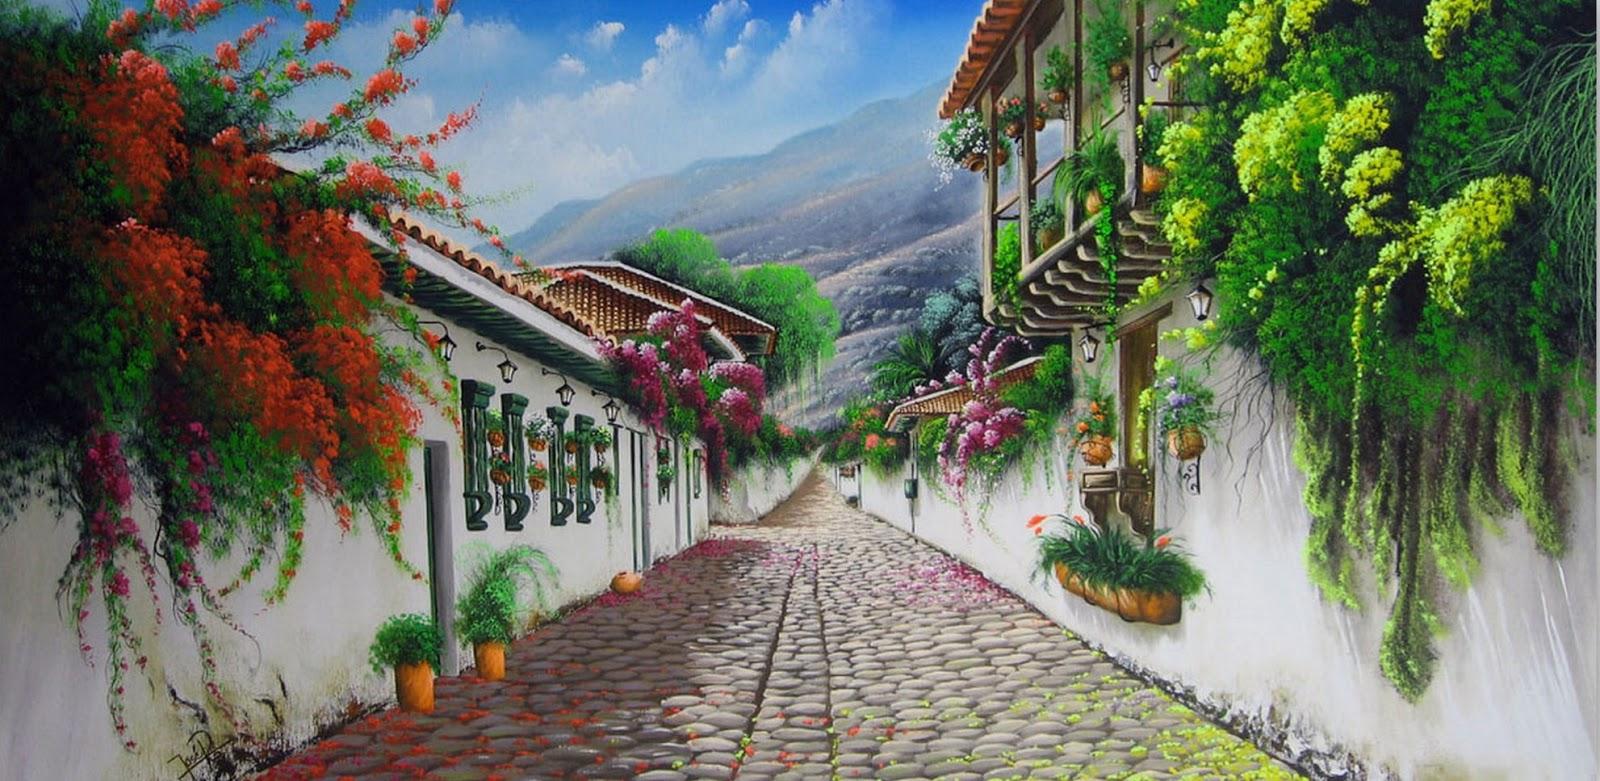 Im genes arte pinturas paisajes campestres jos ra l for Pinturas bonitas para casas